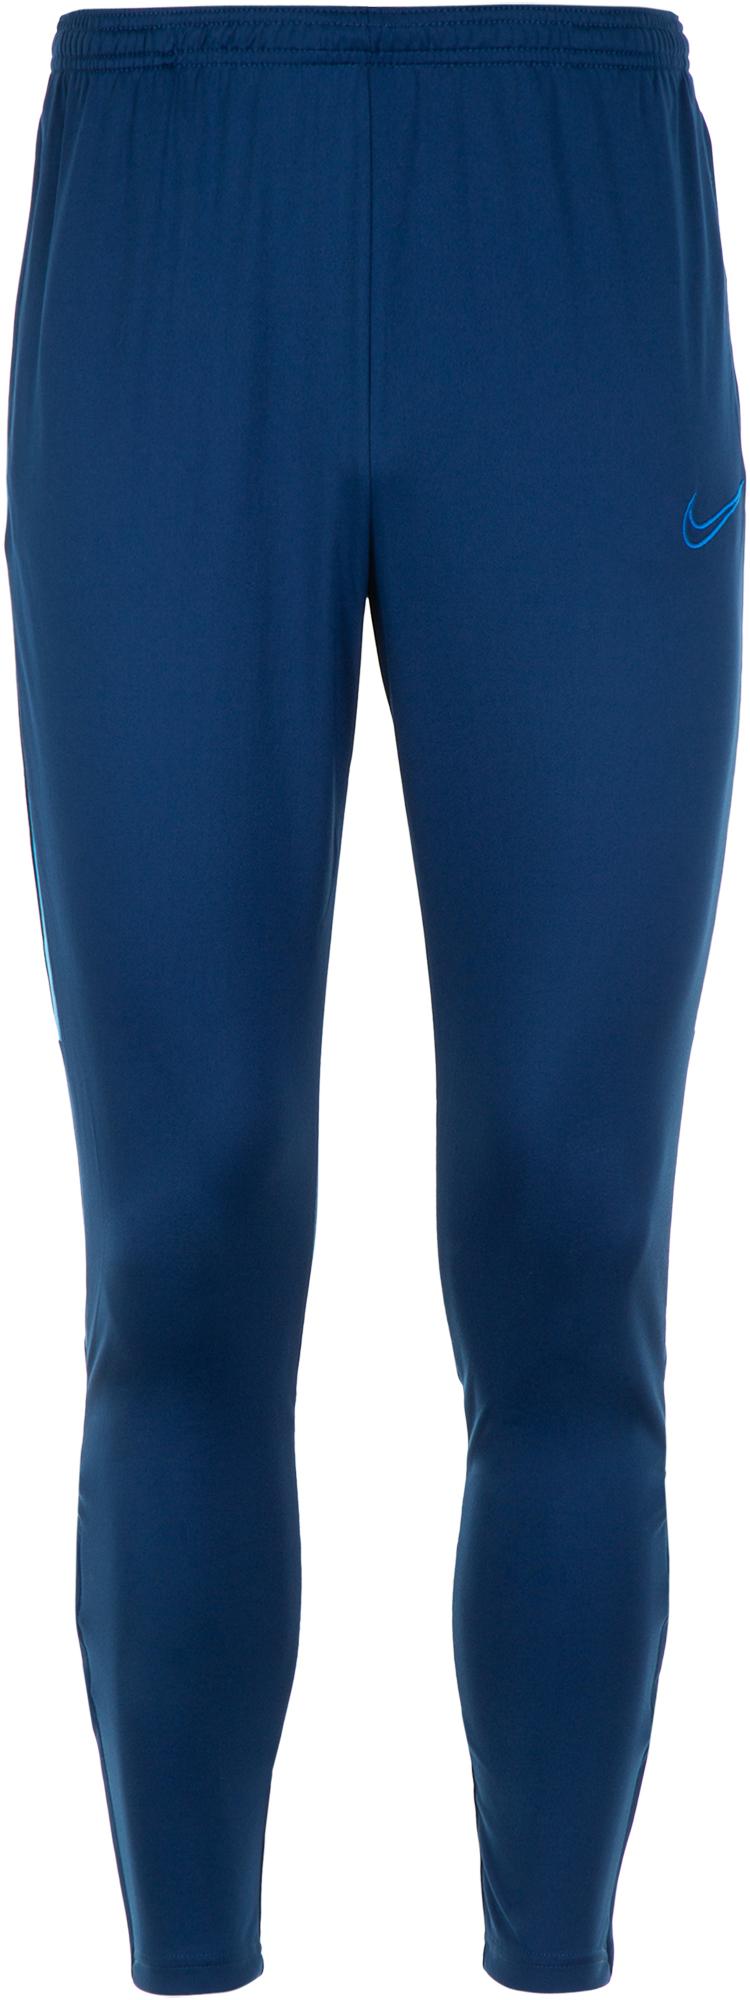 Nike Брюки мужские Nike Dry Academy, размер 52-54 nike перчатки мужские nike размер l